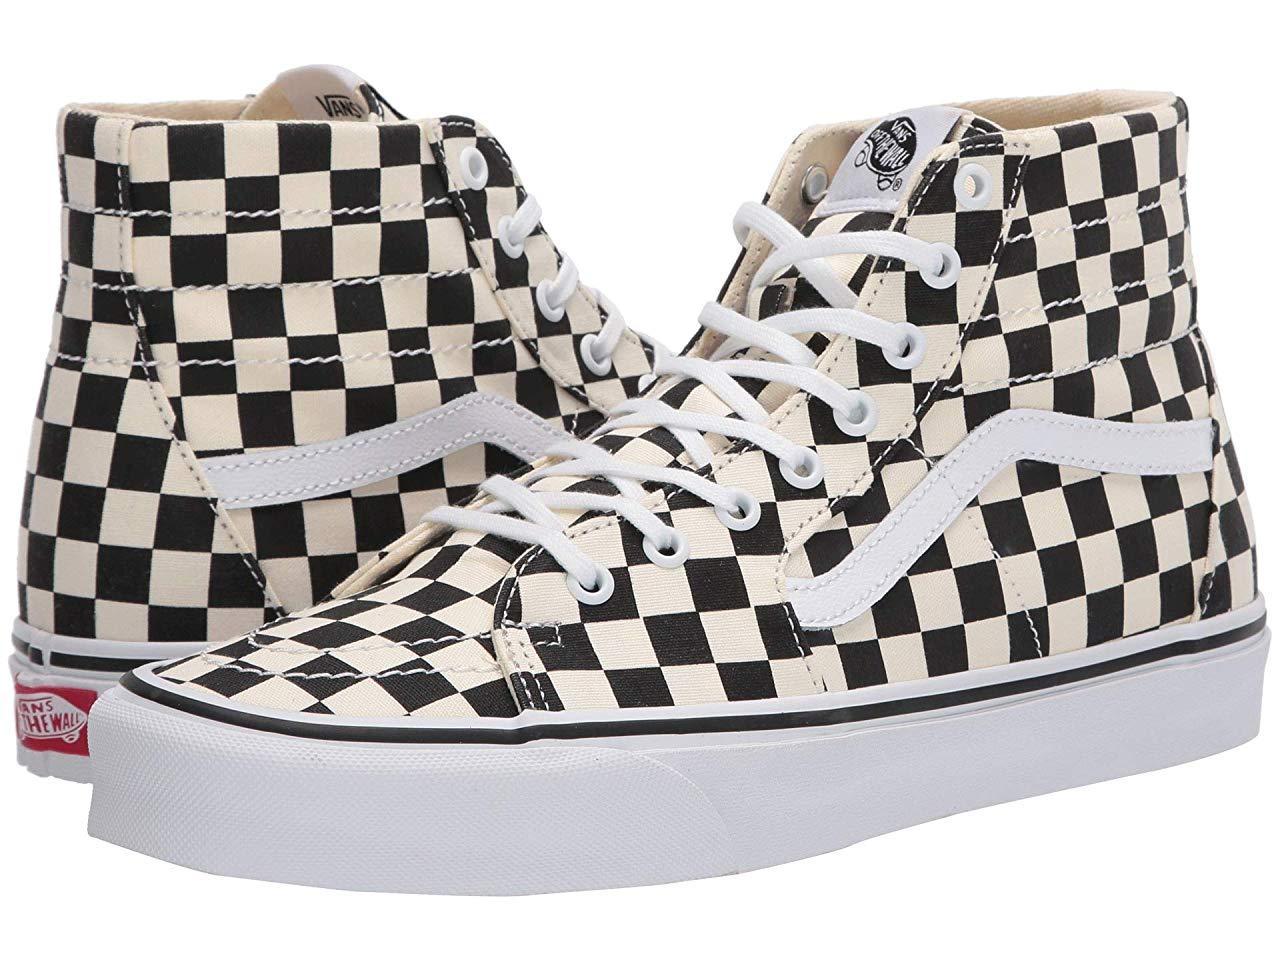 Кроссовки/Кеды (Оригинал) Vans Sk8-Hi™ Tapered (Checkerboard) Black/True White